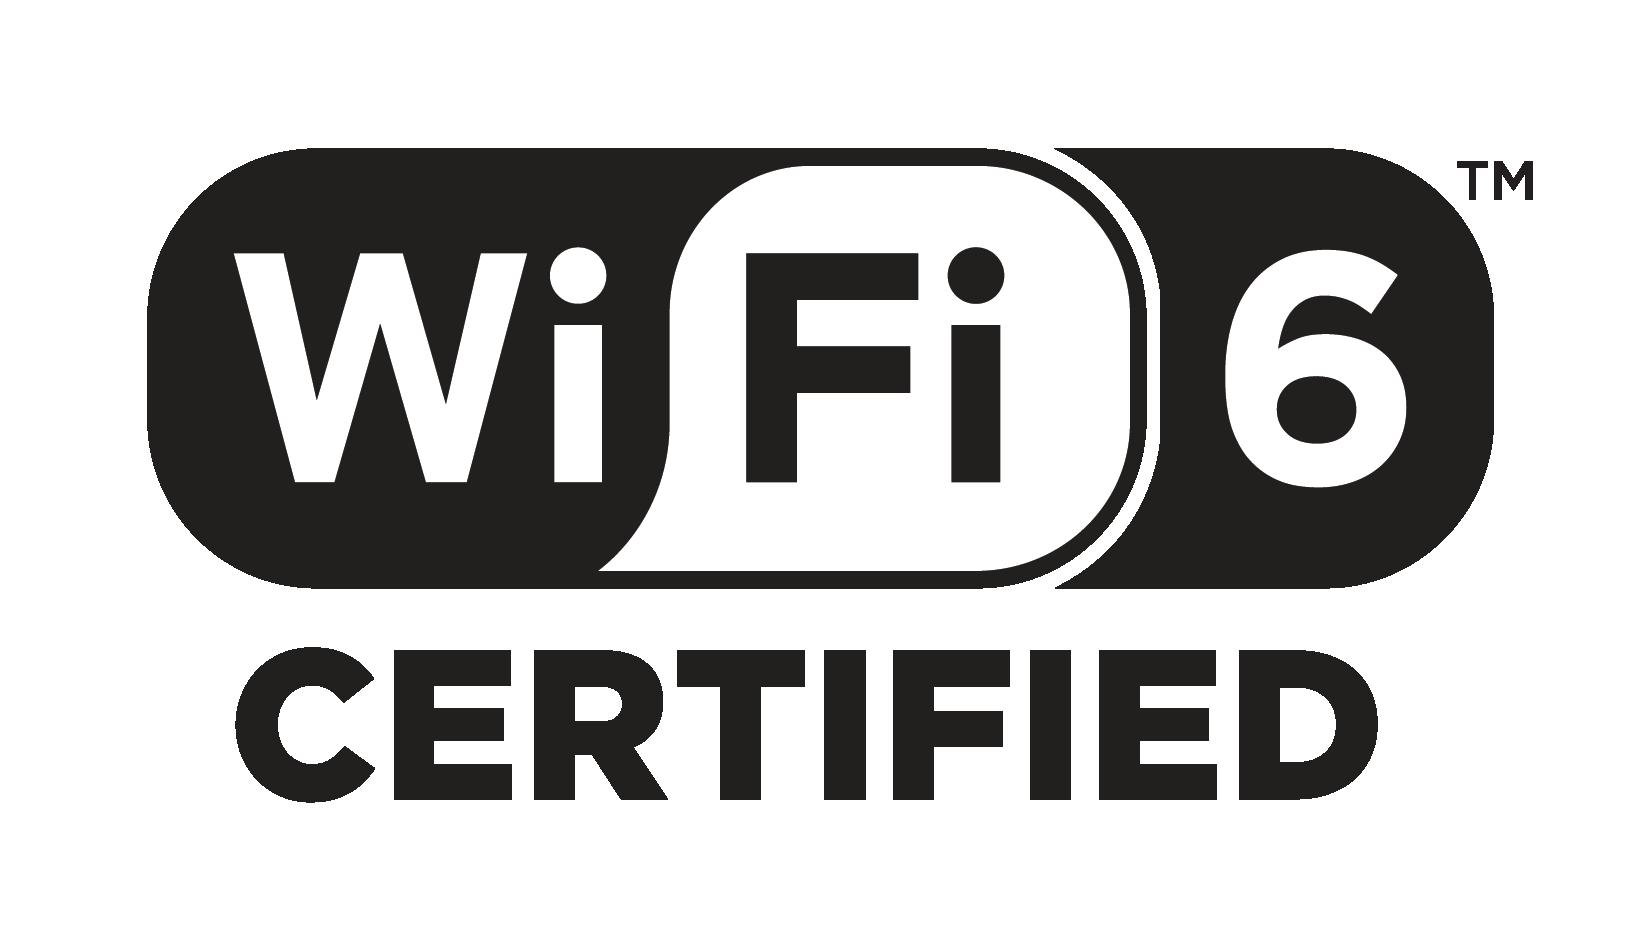 Wi-Fi CERTIFIED 6